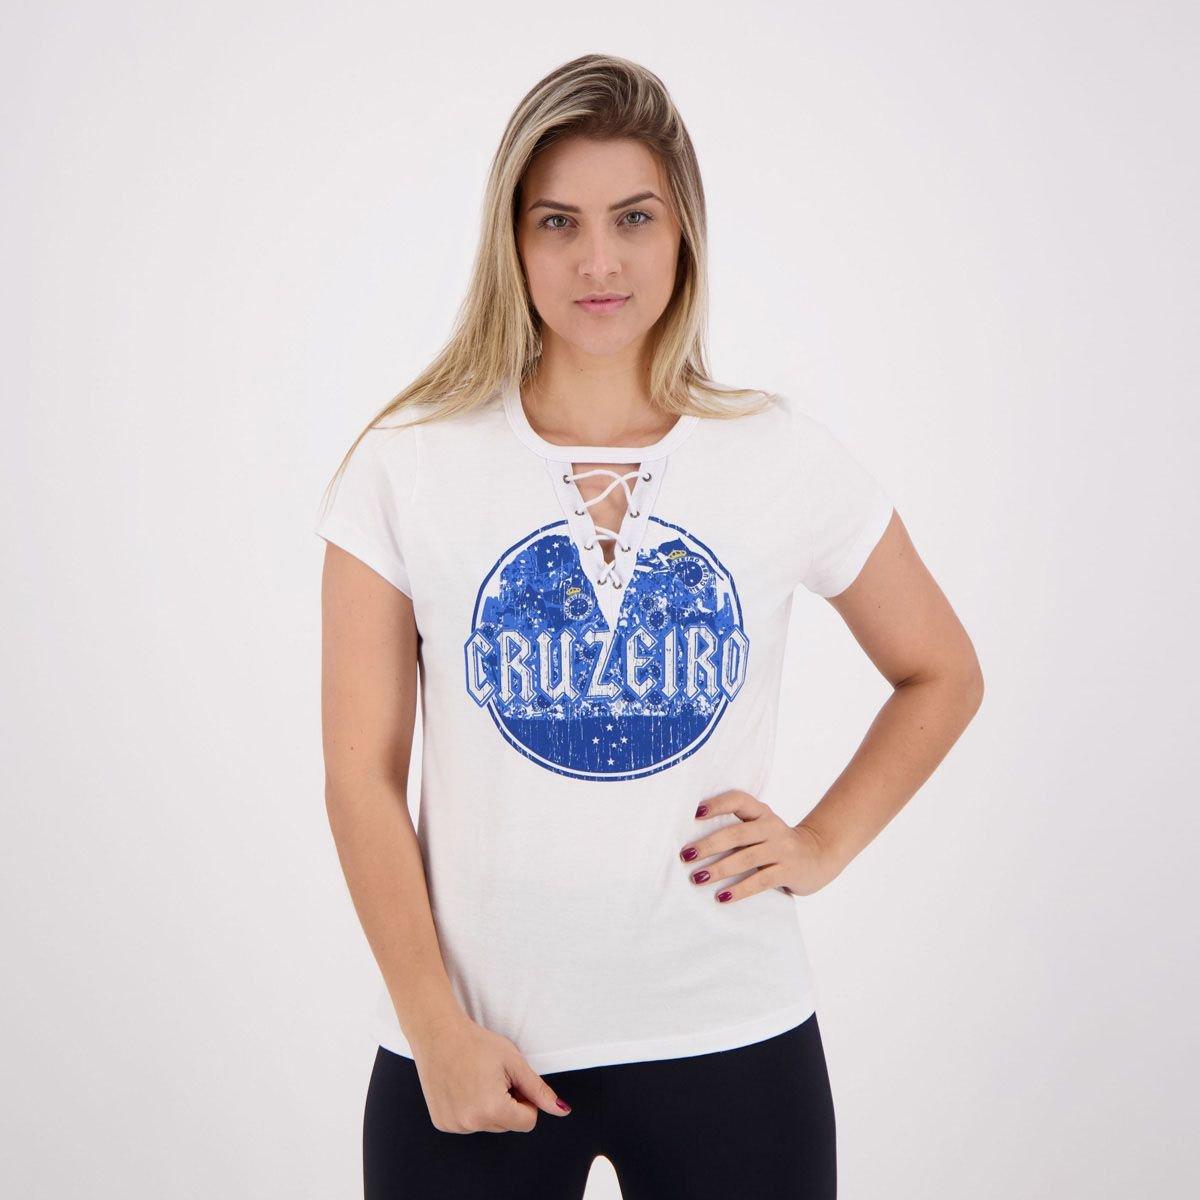 Moda futebol: camisetas femininas